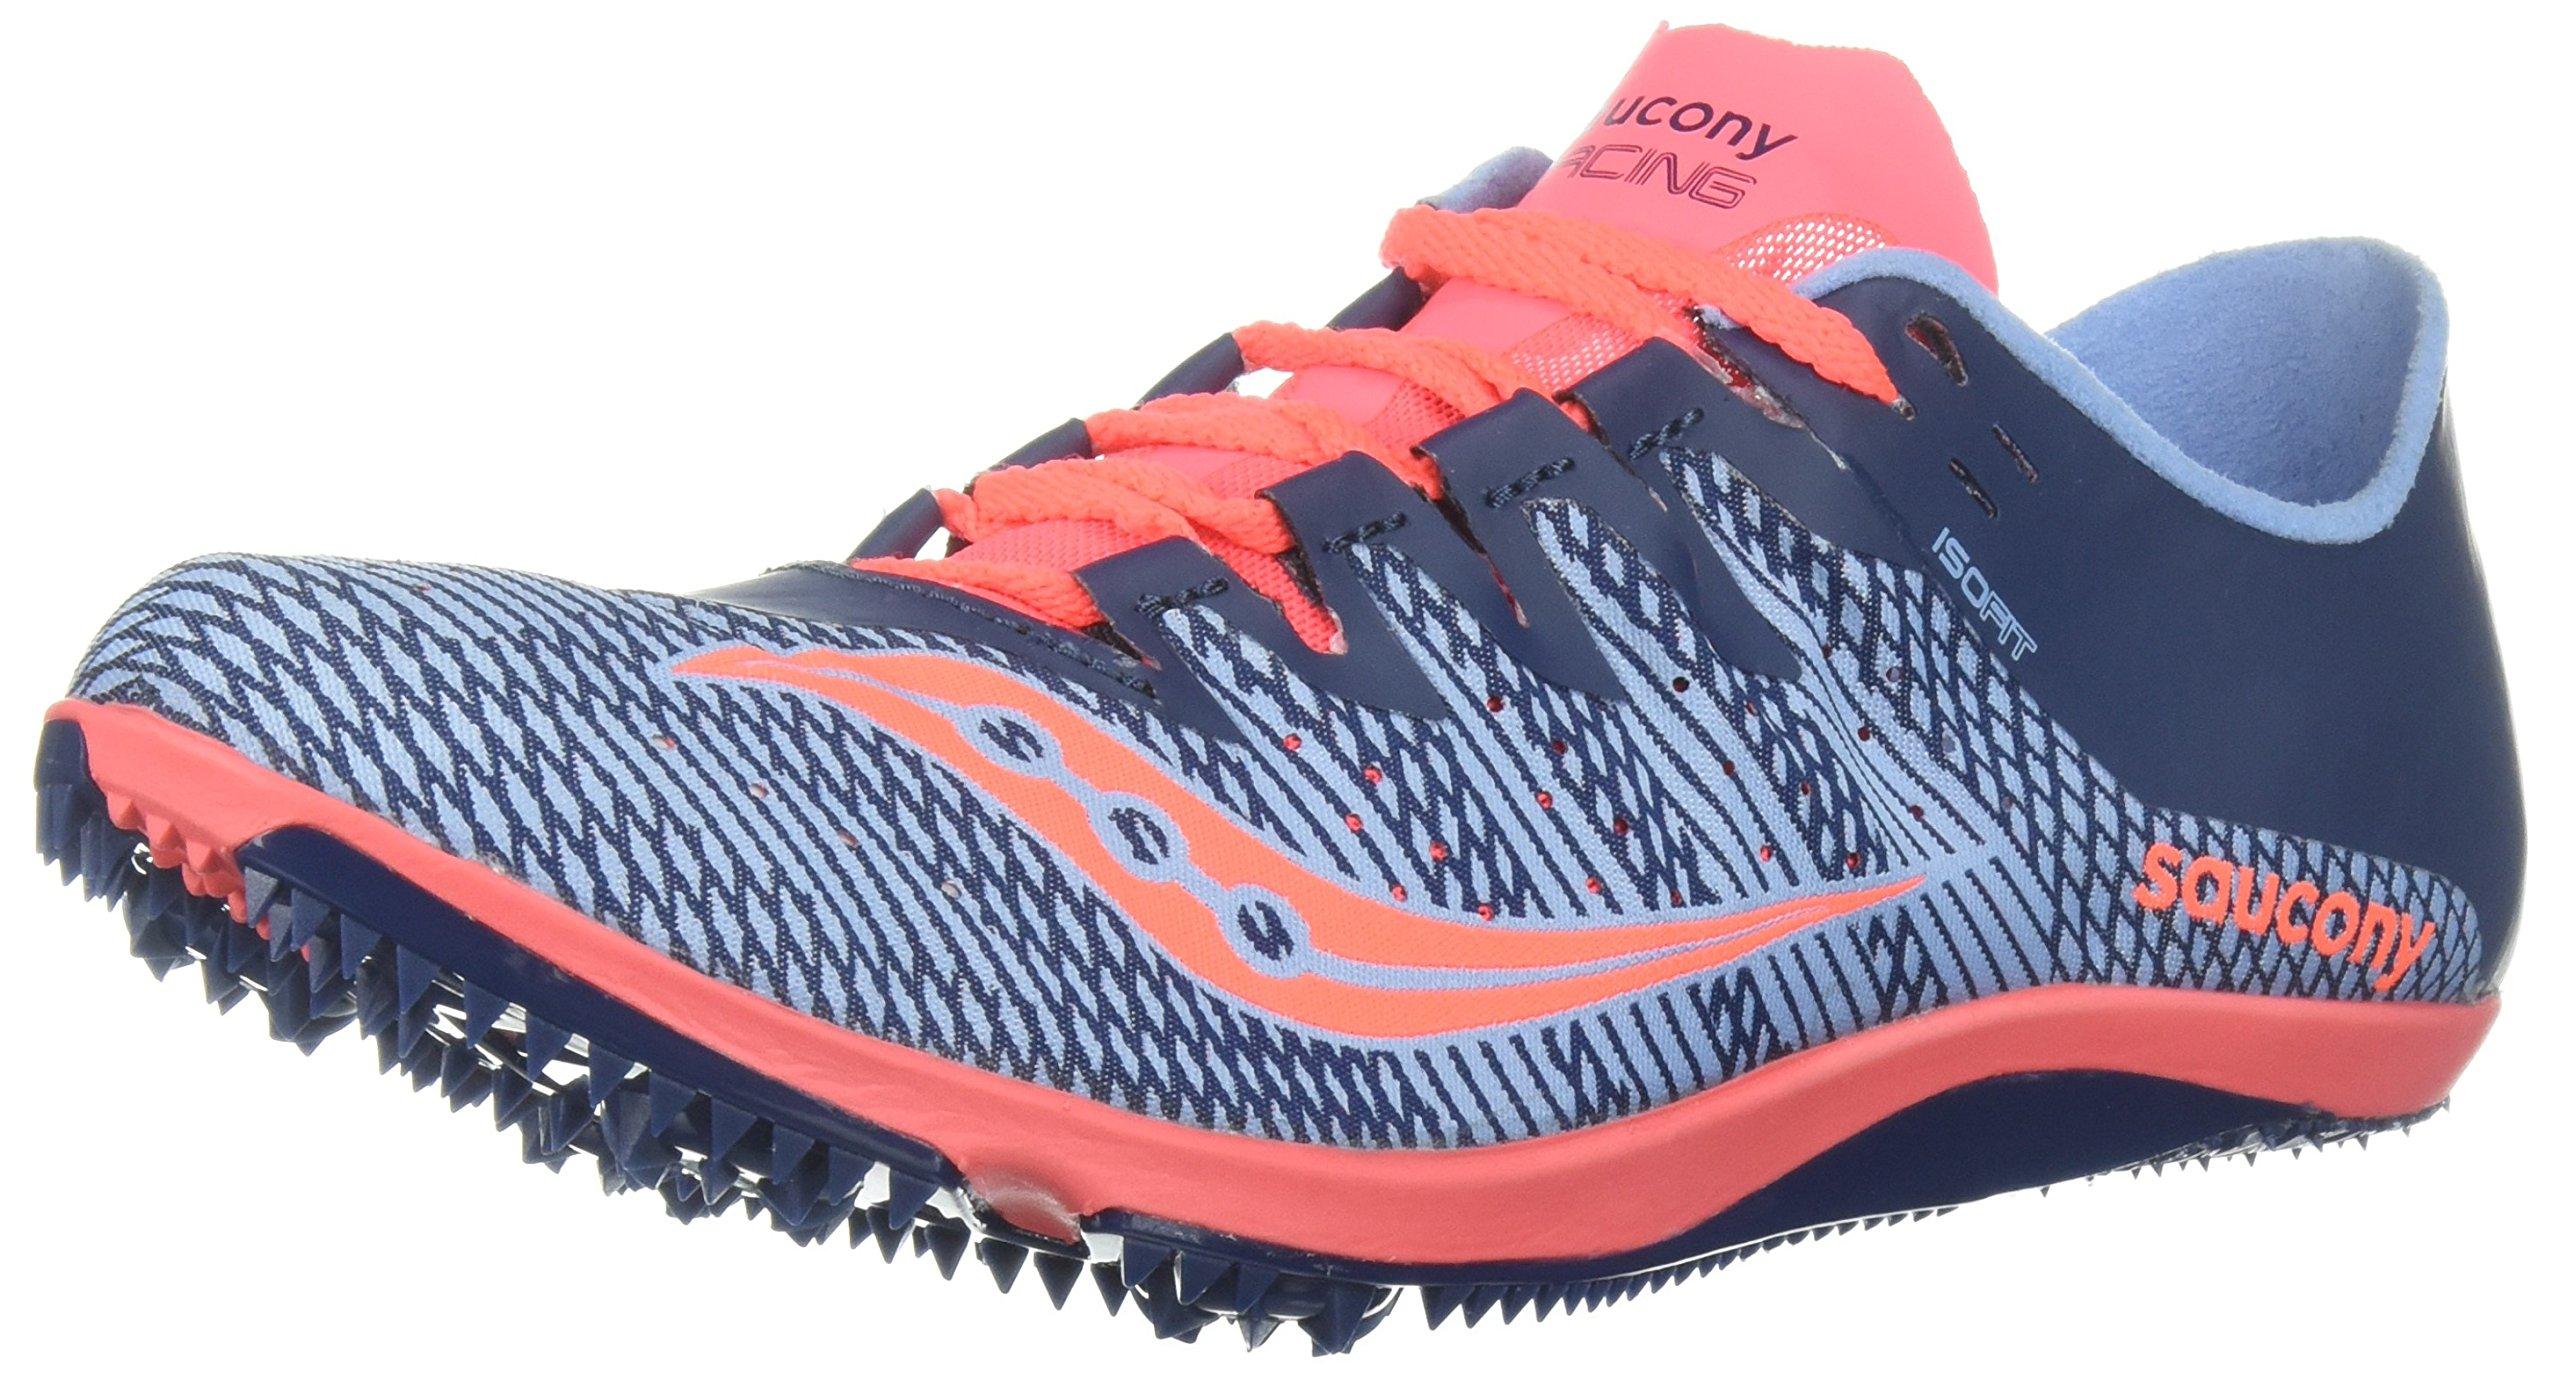 818PD7mYzmL - Saucony Endorphin 2 Women's Running Spikes - SS19